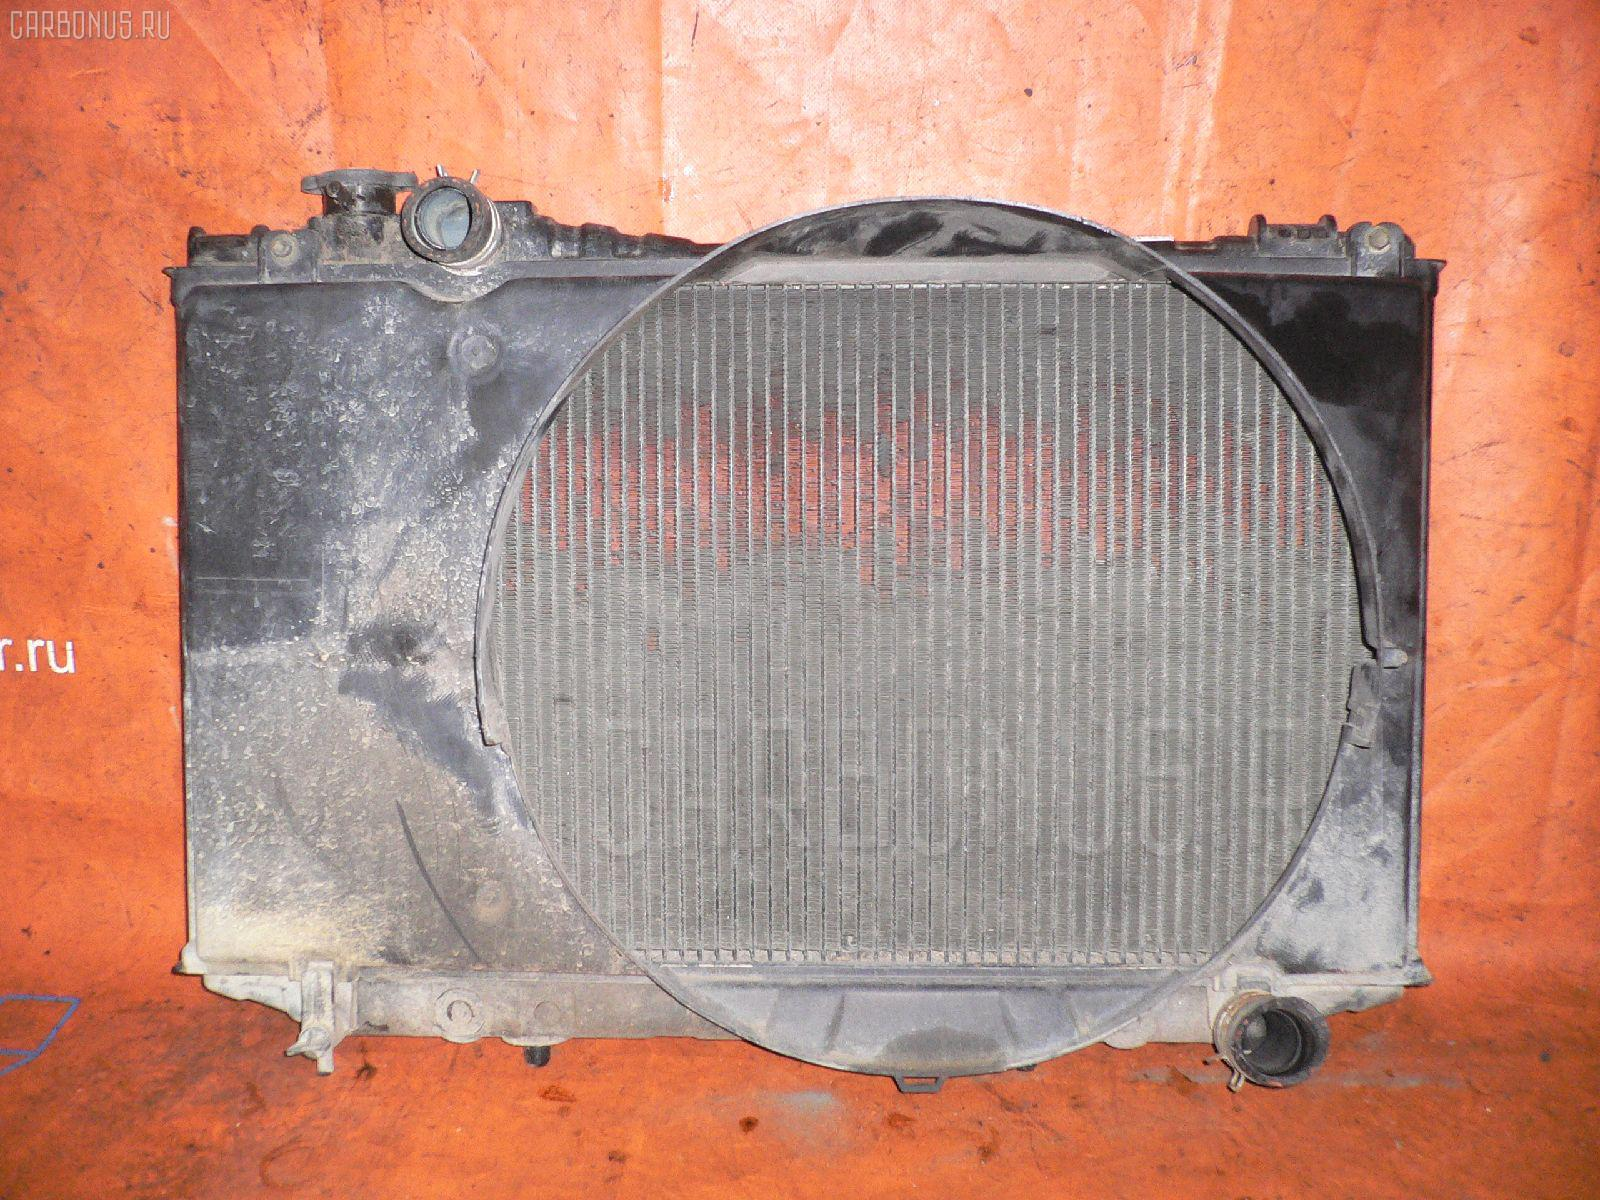 Радиатор ДВС TOYOTA MARK II WAGON GX70G 1G-FE. Фото 2